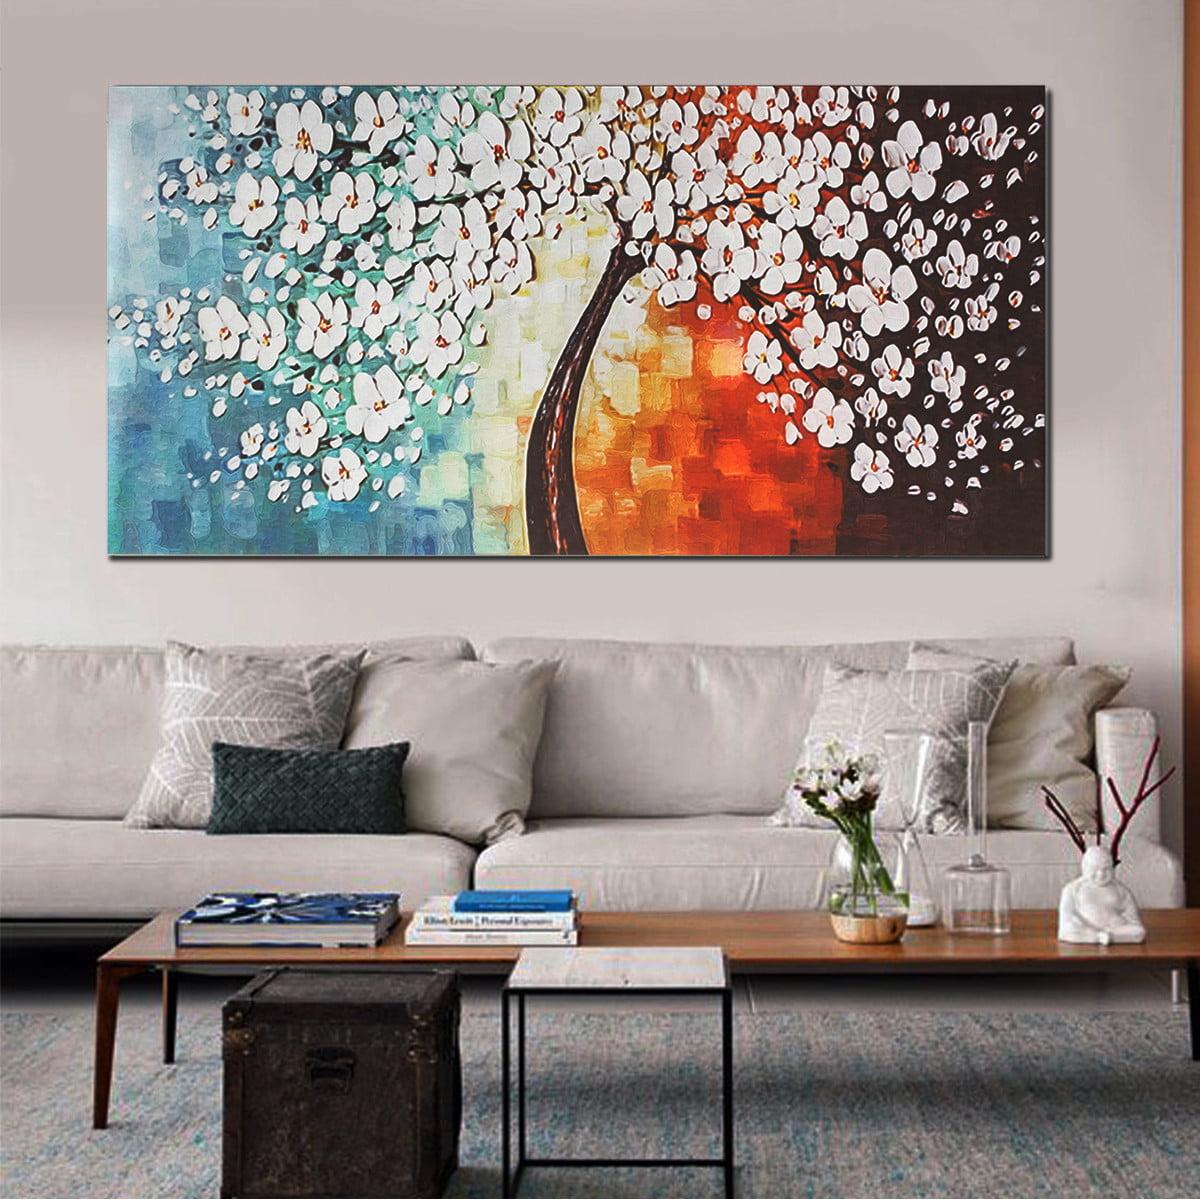 Unframe canvas prints picture white plum wall art paintings frameless home decor 23 6x47 2 walmart com